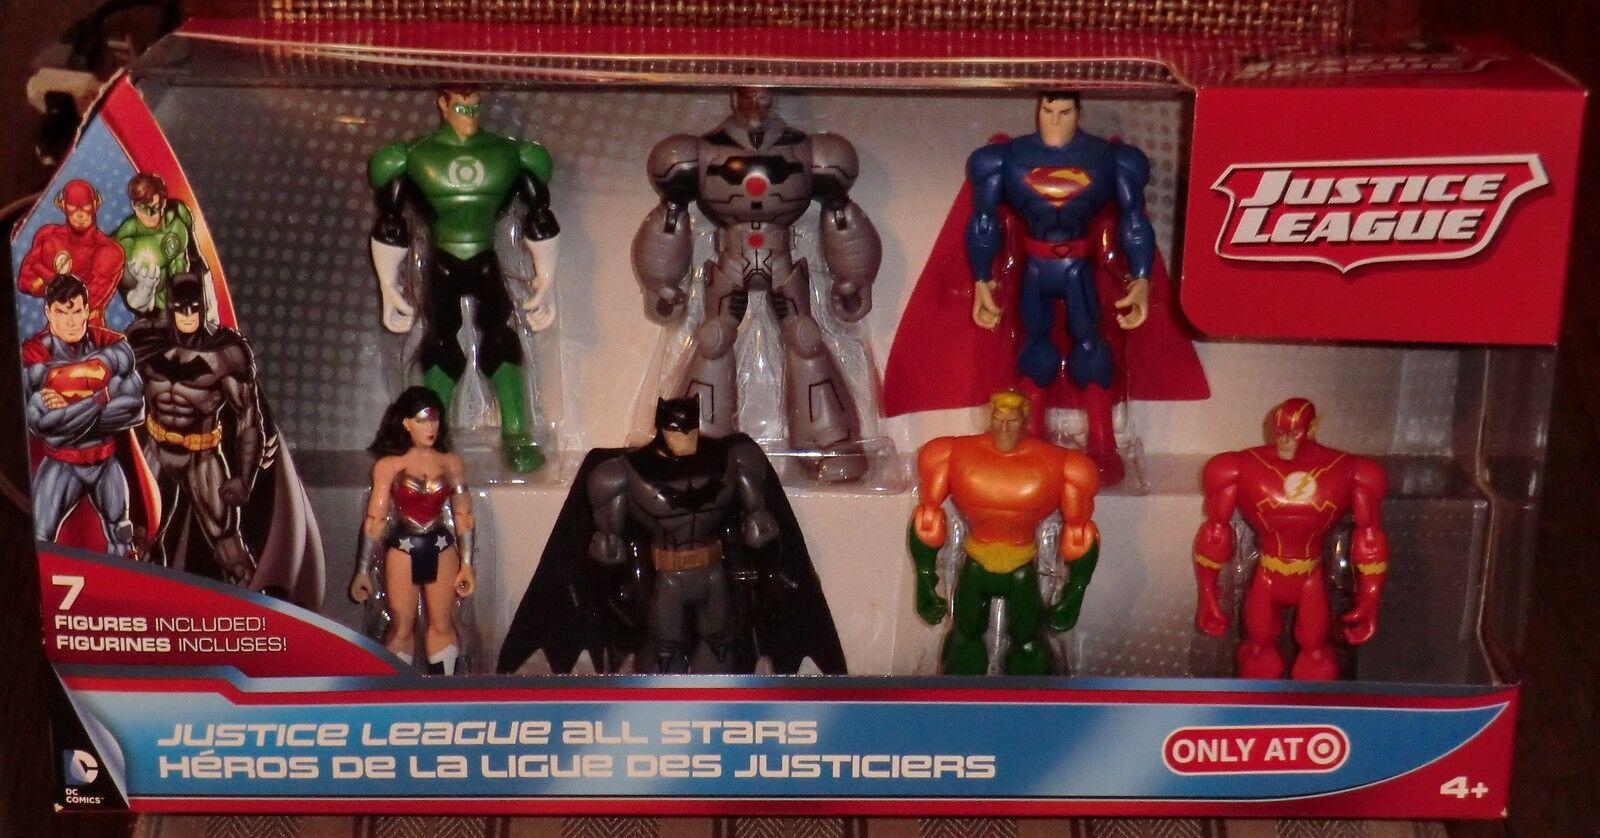 JUSTICE LEAGUE  TARGET EXCLUSIVE   7 FIGURE BOX SET   MIB